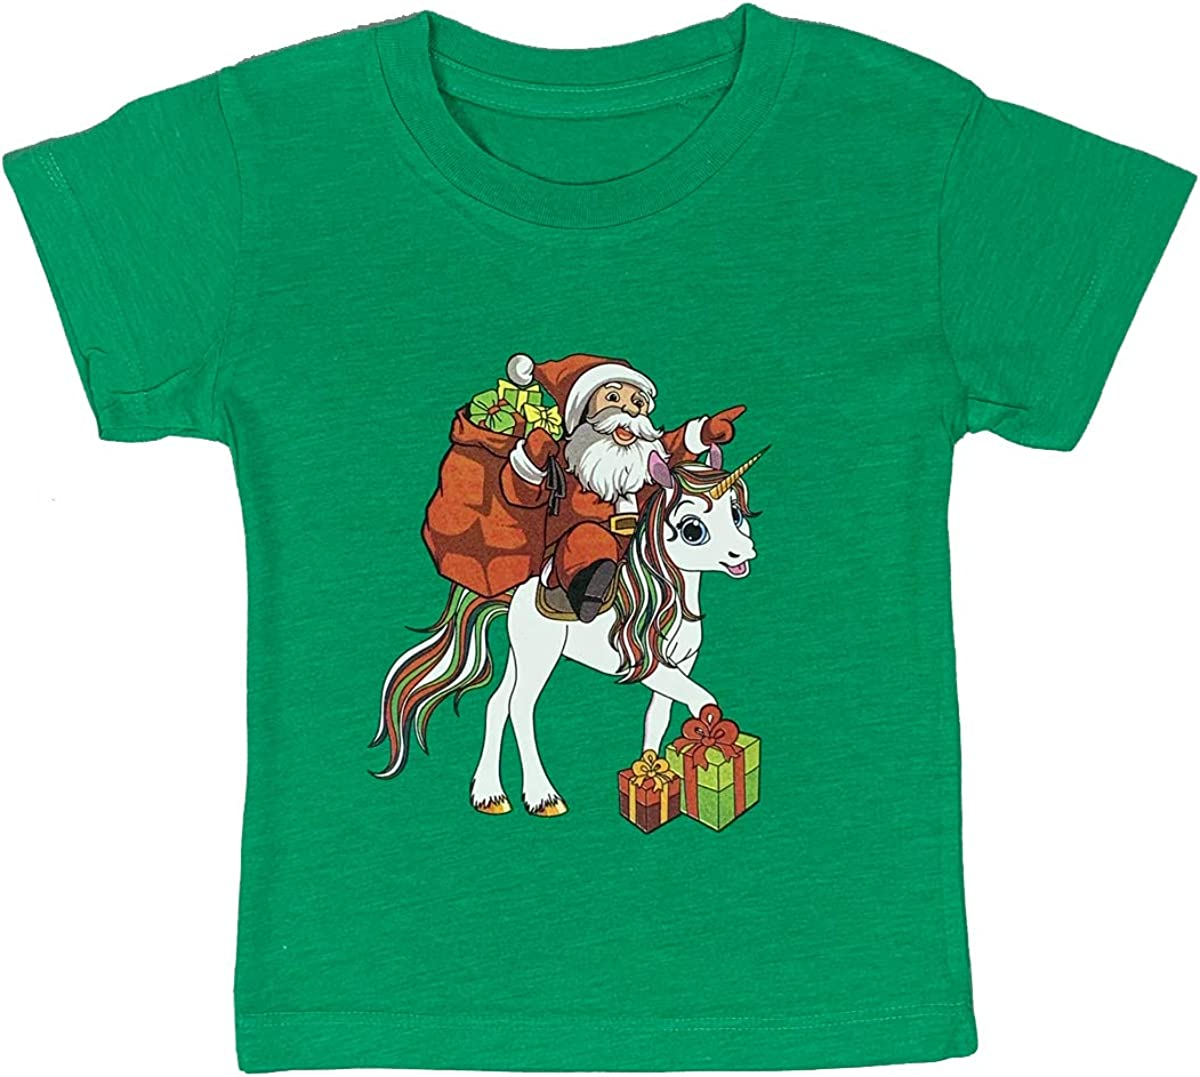 Santa Dinosaur Toddler Baby Christmas Holiday Shirt Christmas Truck Santa Unicorn and Rhinestone Tree Youth